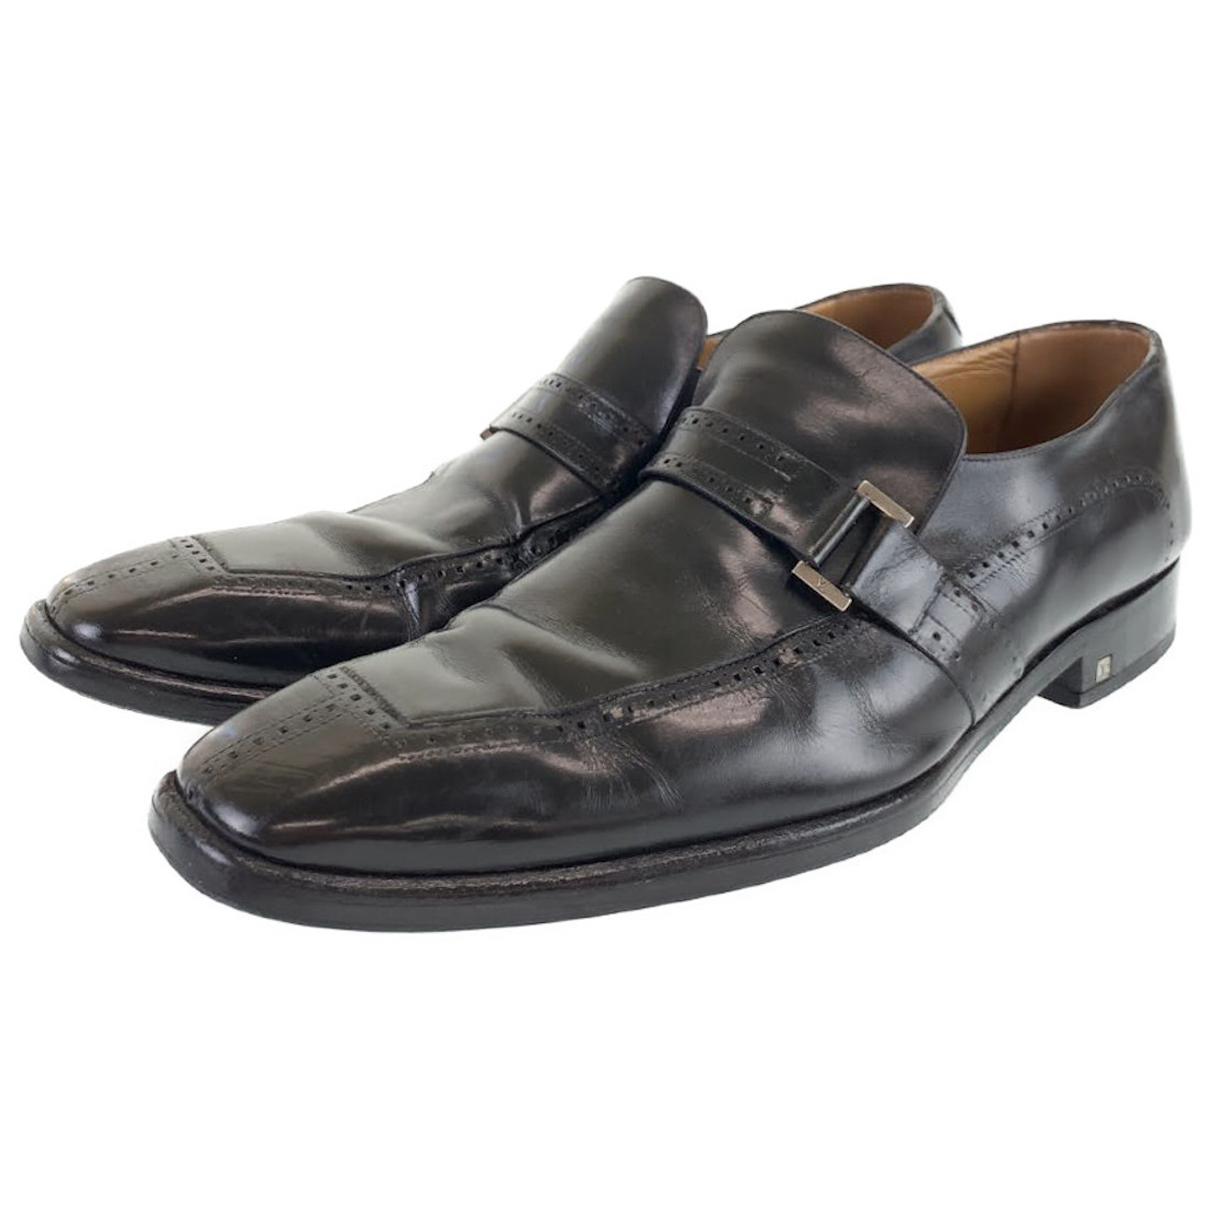 Louis Vuitton N Leather Flats for Men 8 UK